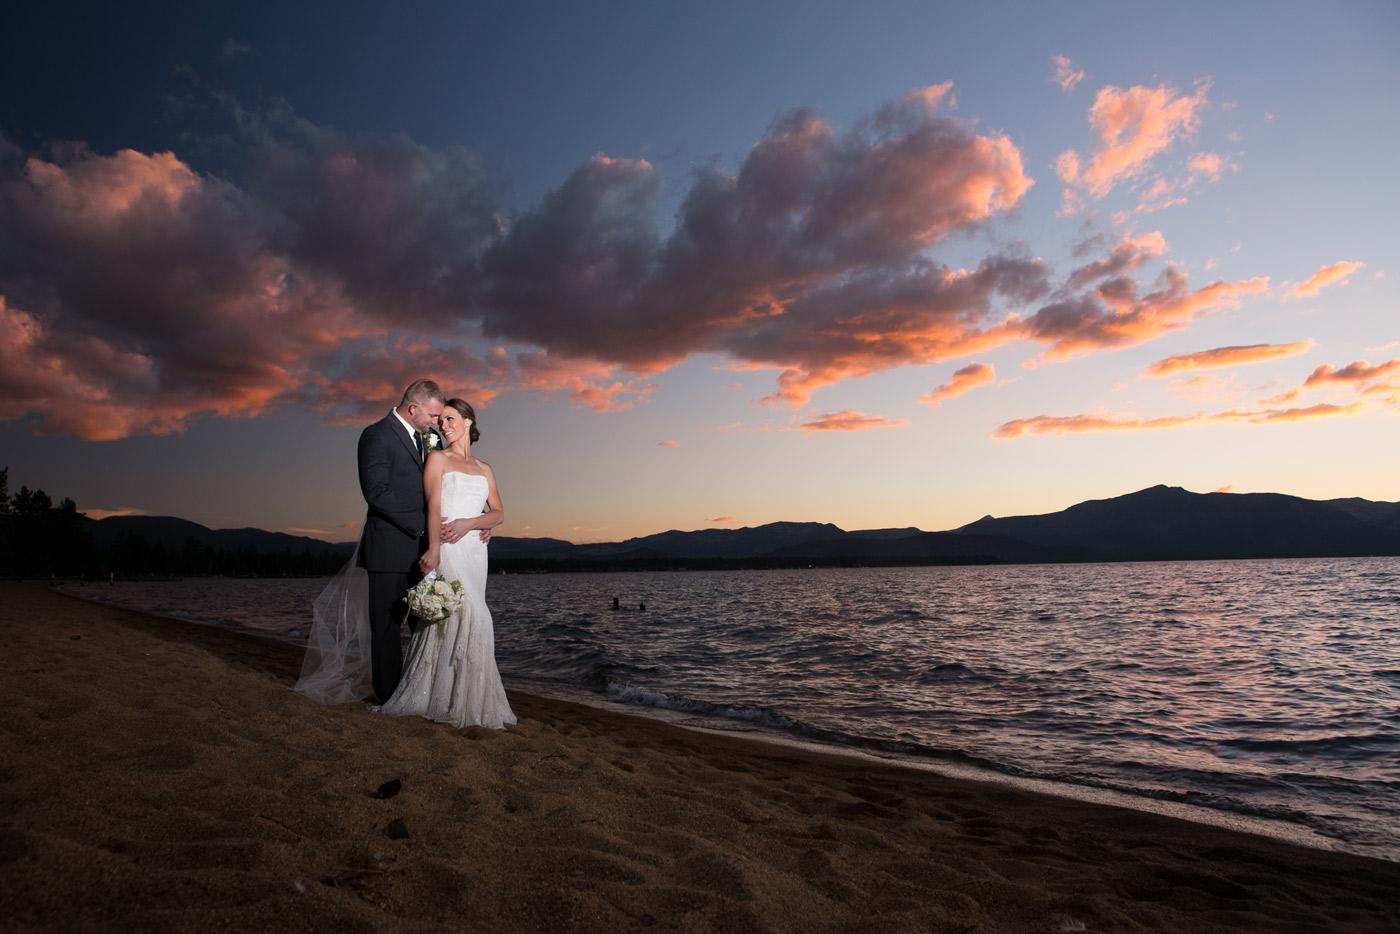 Edgewood South Lake Tahoe